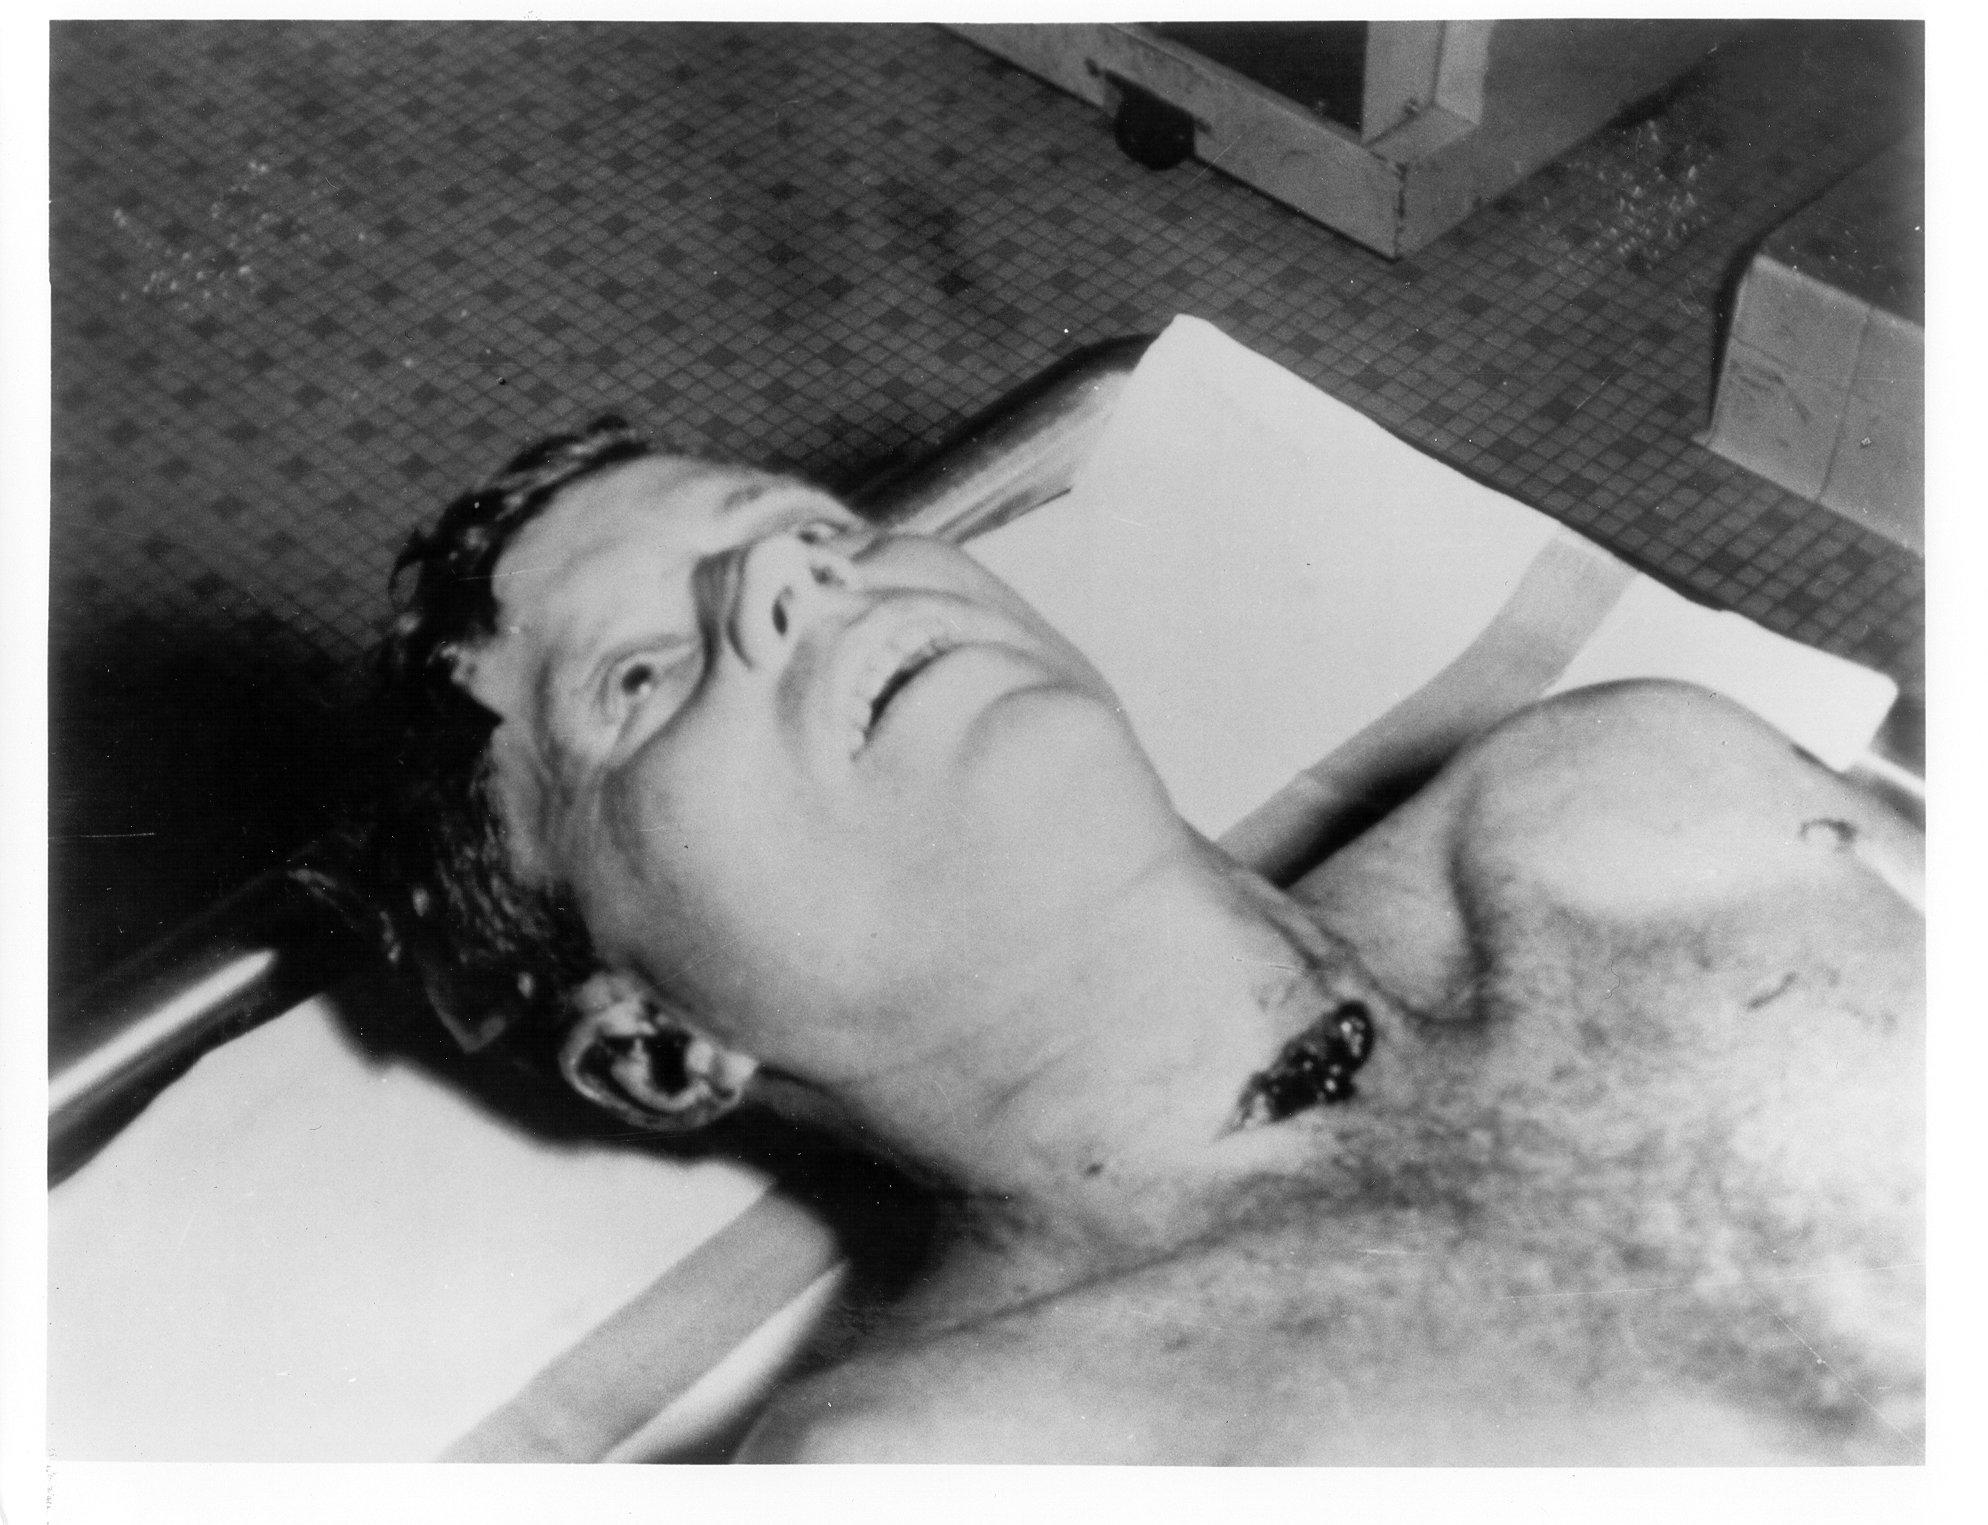 JFK Head Wound Forensics | Political Film Blog